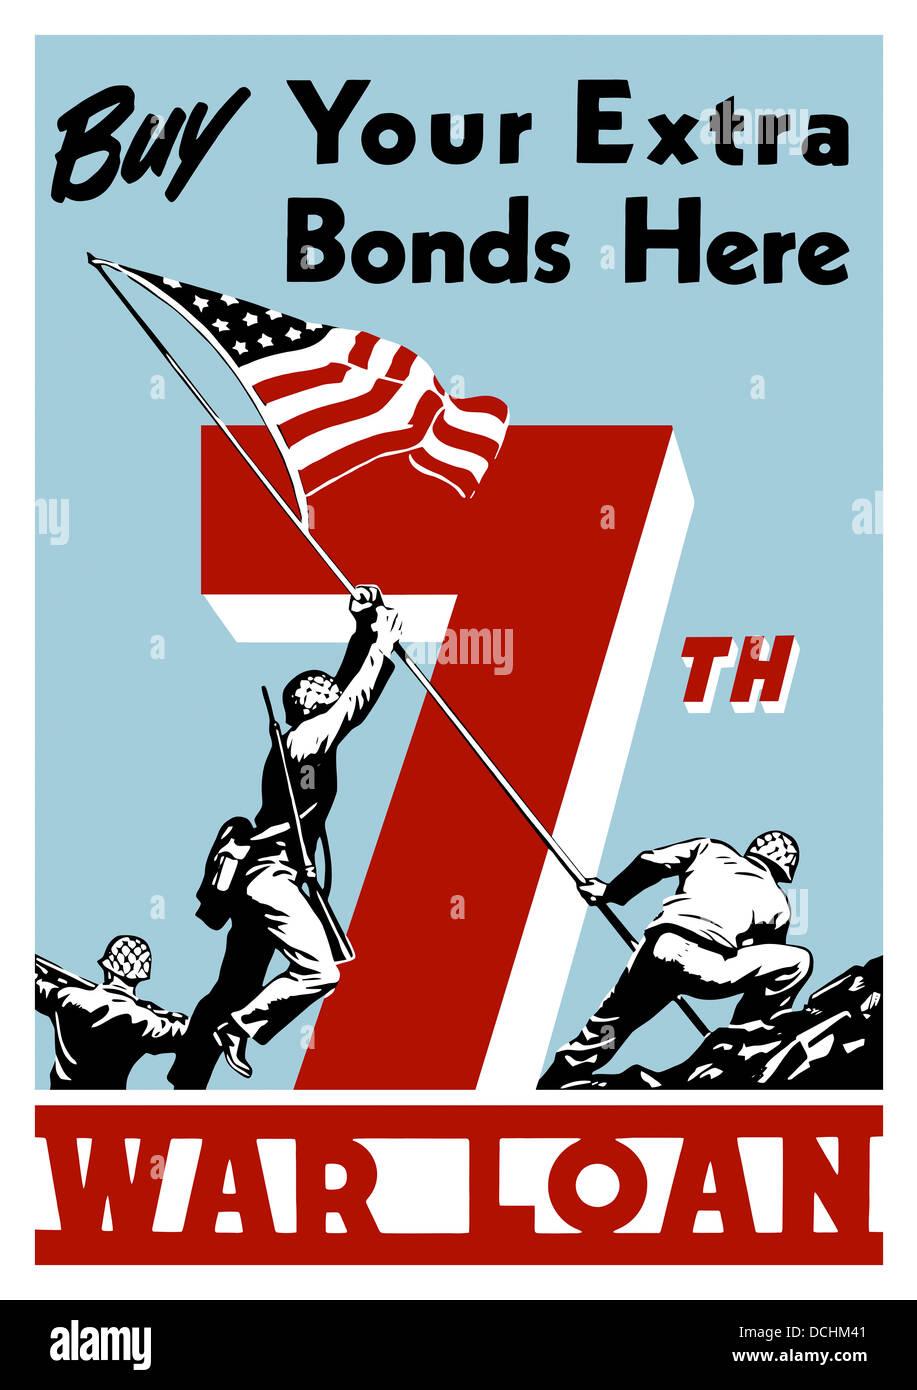 World War II propaganda poster of soldiers raising the American flag. - Stock Image